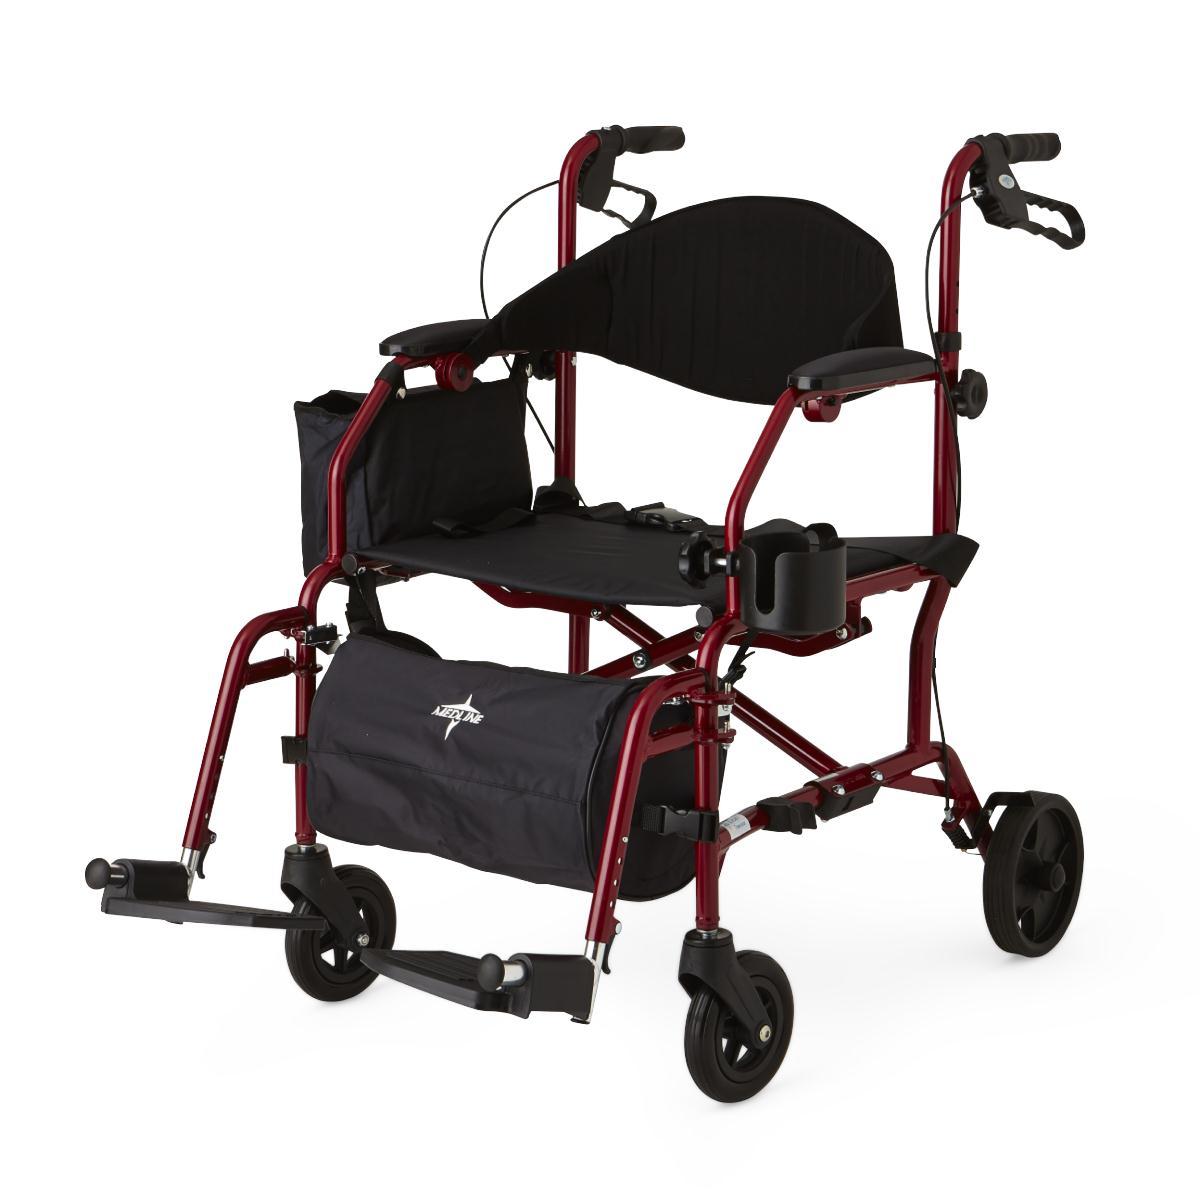 walker chair combo wheelchair ramp width medline combination rollator transport red